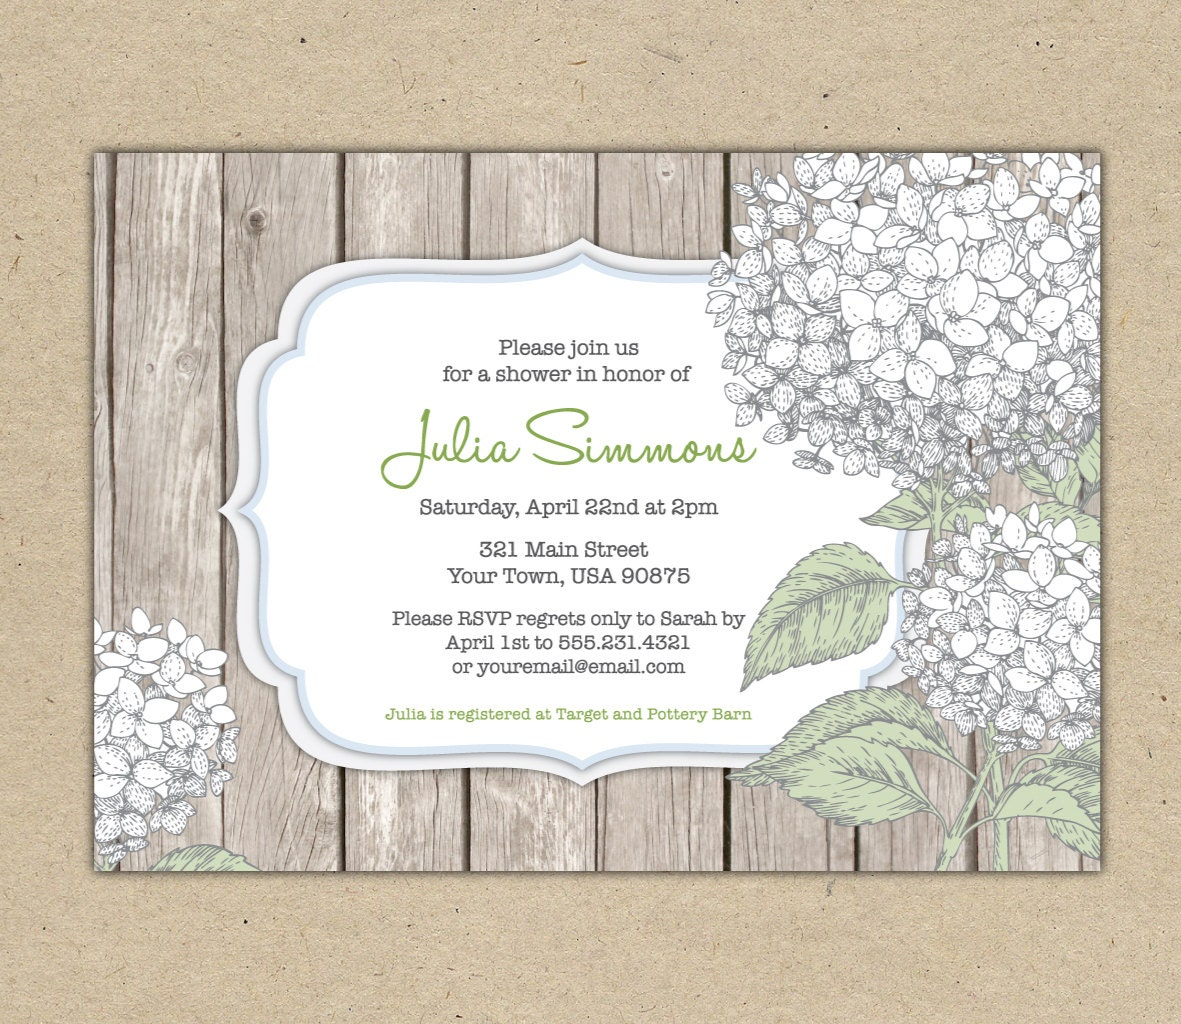 Free Rustic Bridal Shower Invitation Templates Pasoevolistco - Wedding shower invitations free templates